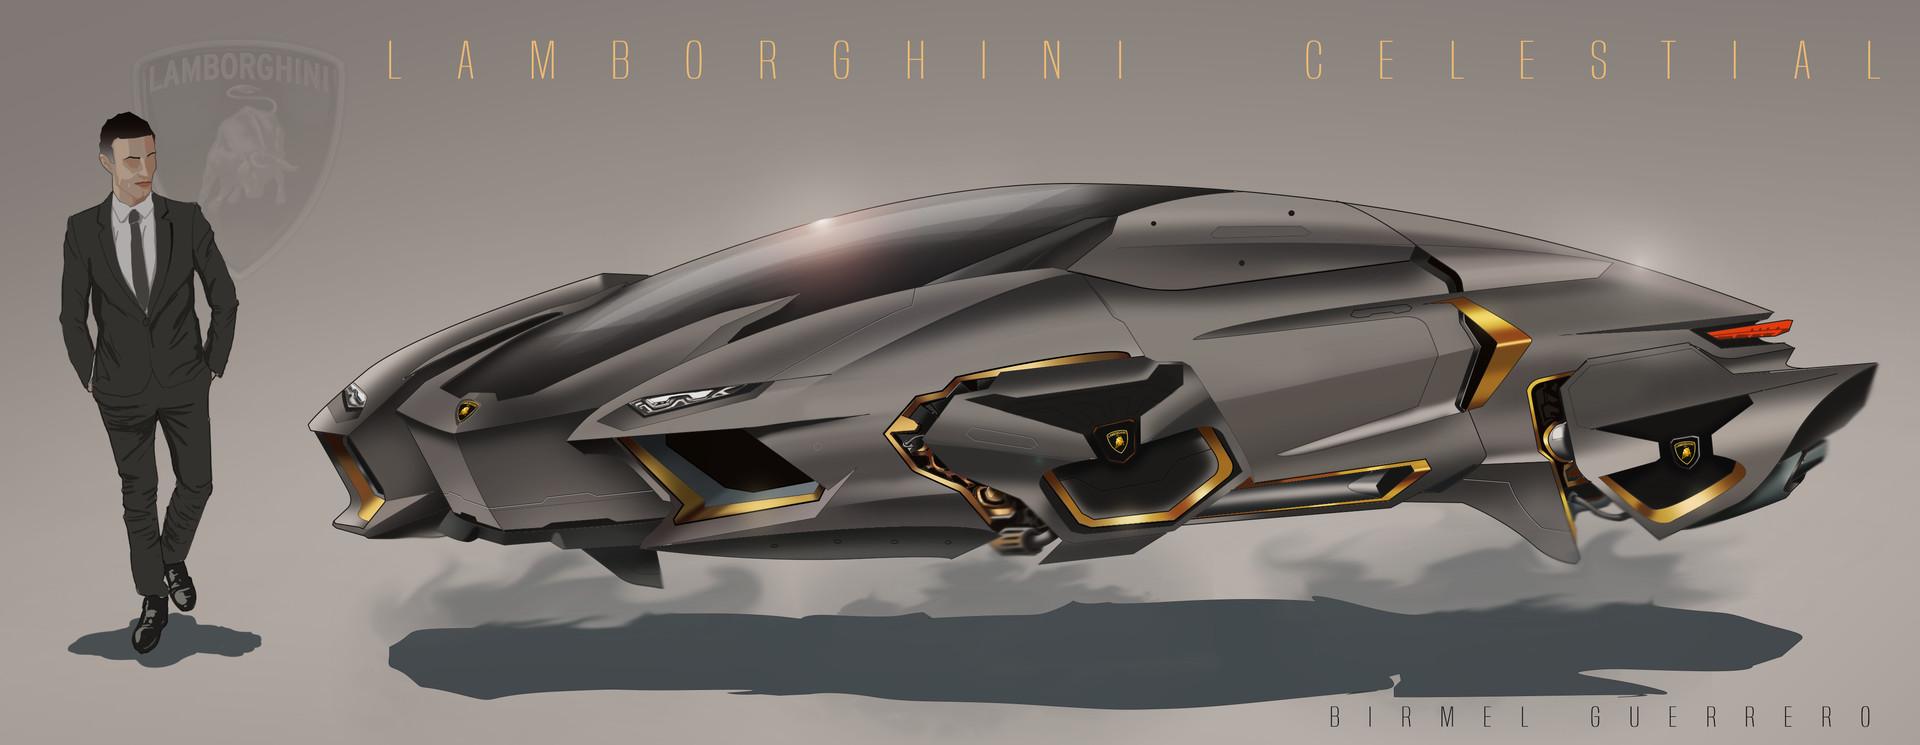 Artstation Lamborghini Celestial Concept Birmel Guerrero